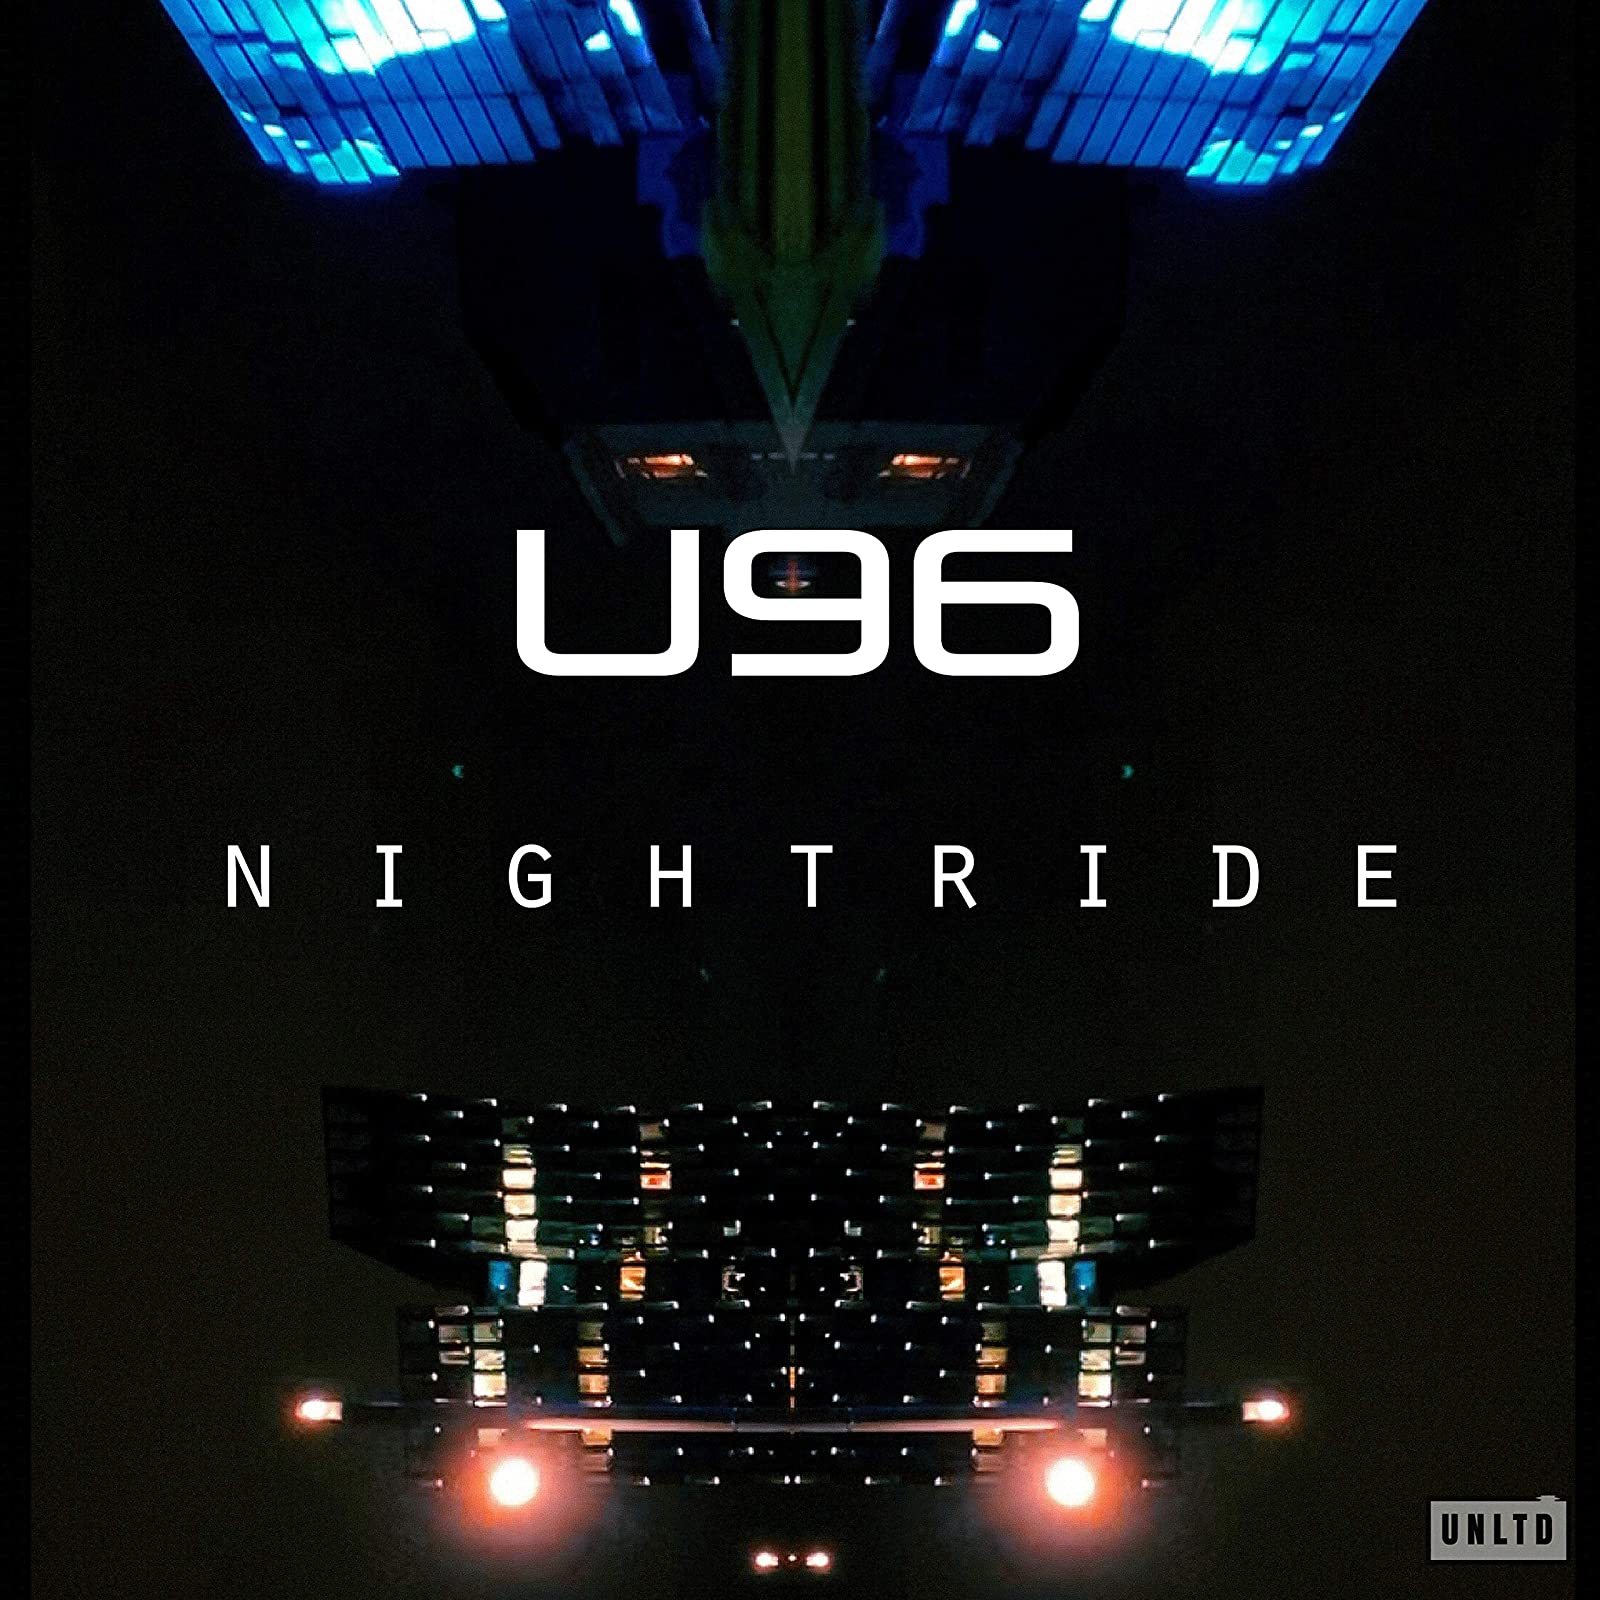 U96 new single is entitled Nightride